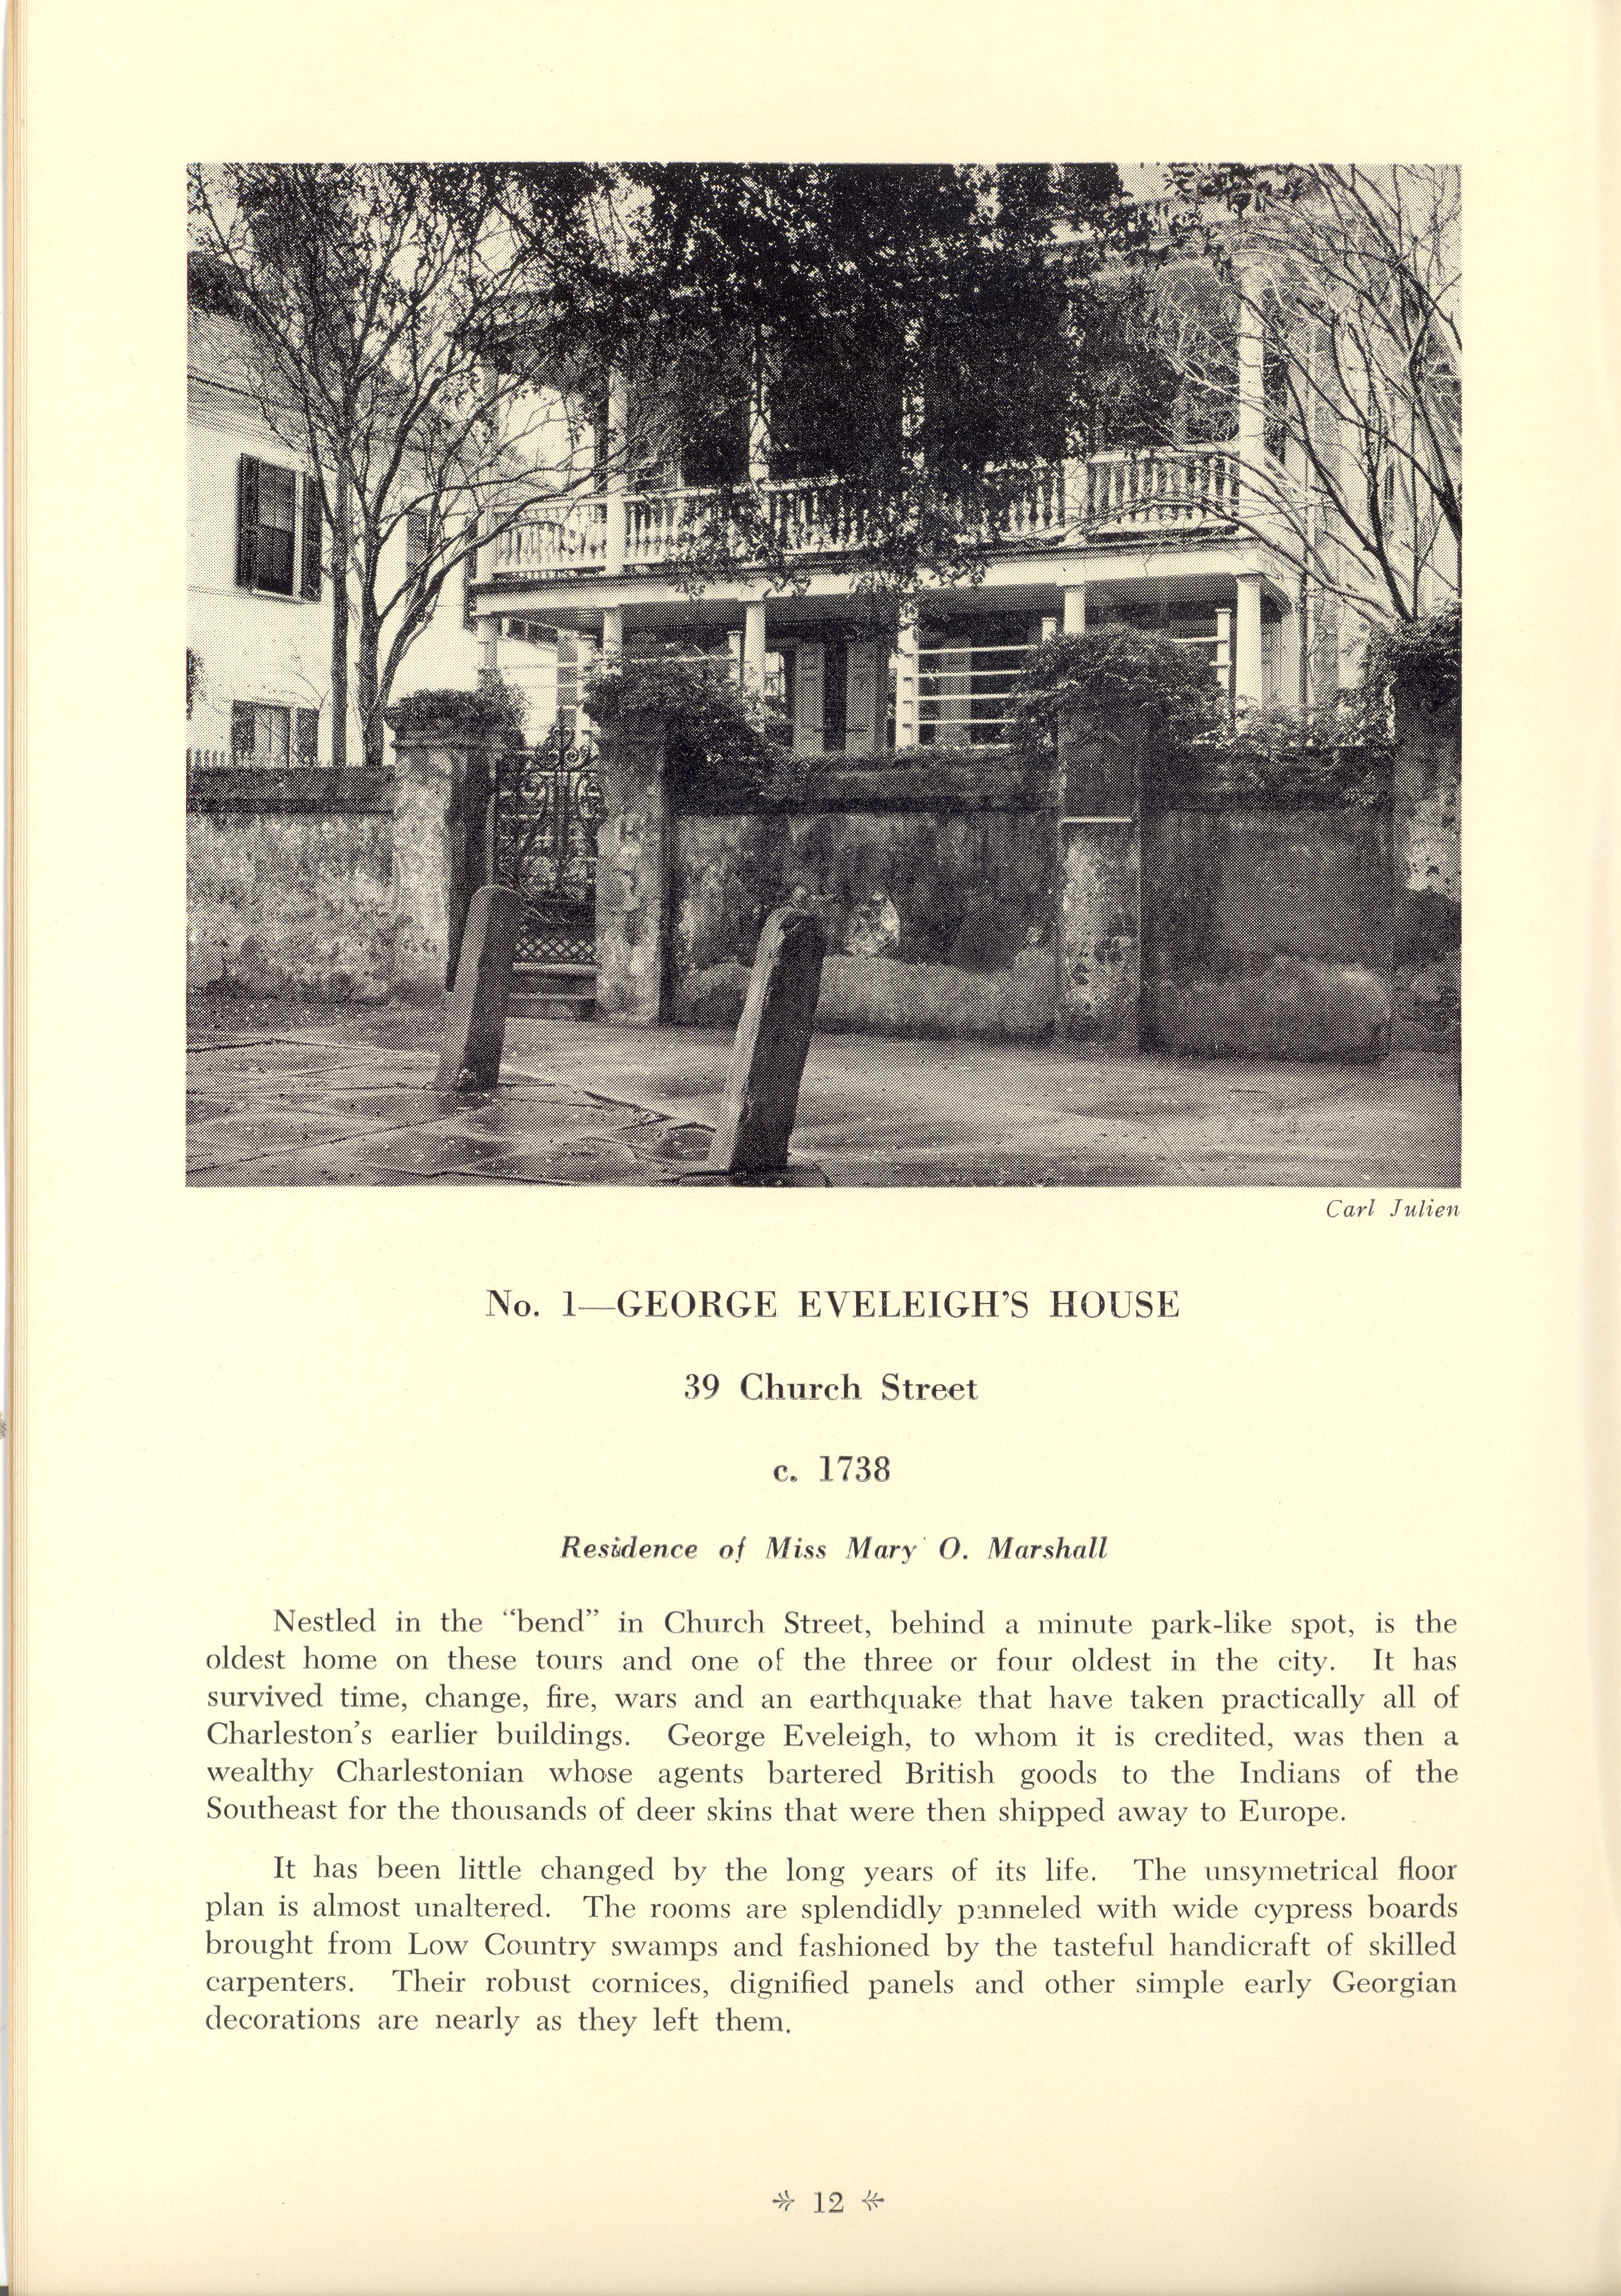 Page 12:  No. 1 - George Eveleigh's House, 39 Church Street, c. 1738